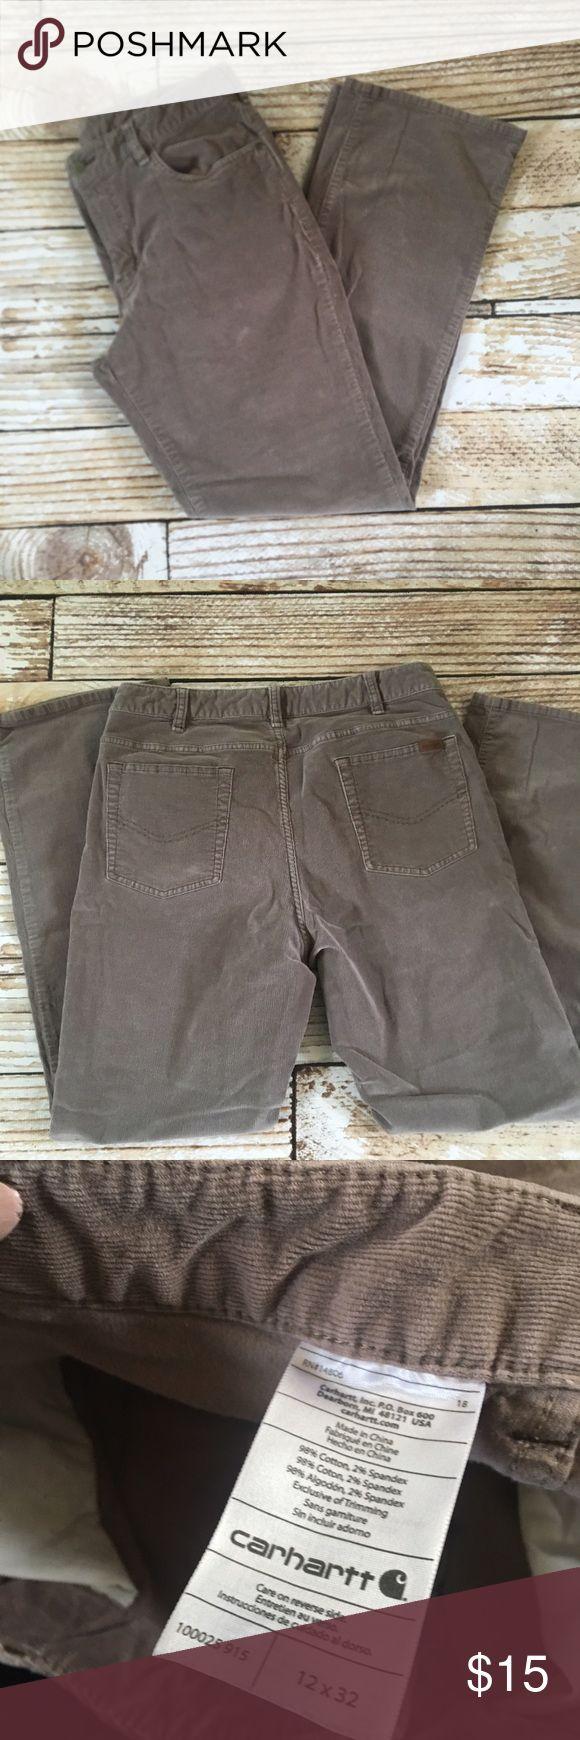 Carhartt corduroy boot cut pants size 12 Carhartt corduroy boot cut pants size 12 Carhartt Pants Boot Cut & Flare